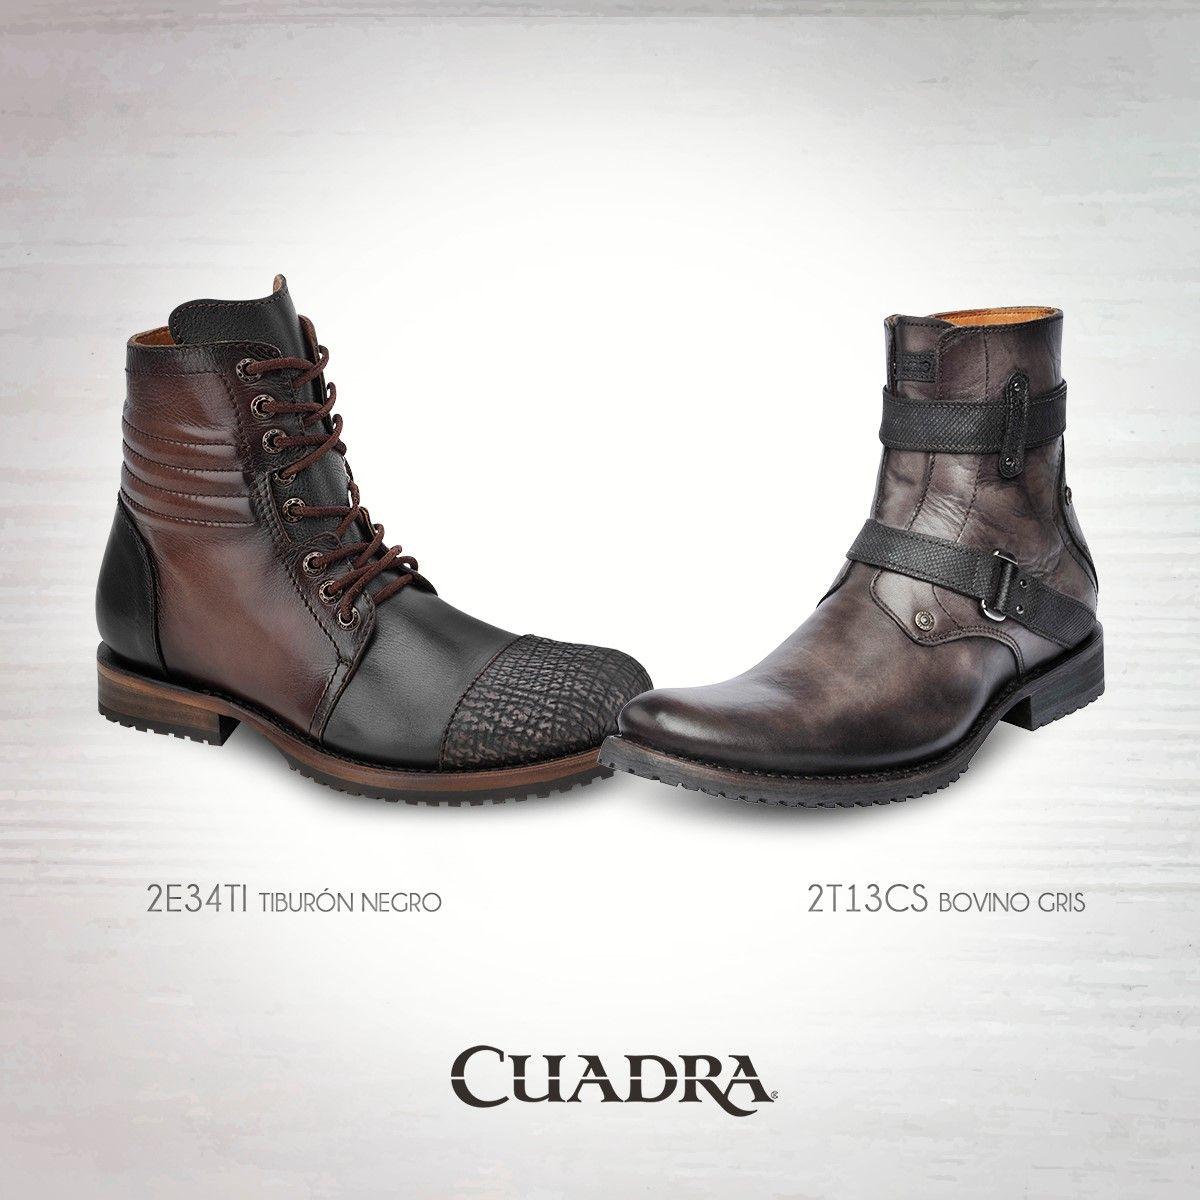 b2f9726ba3 CUADRA  boots  Botas  Exotic  leather  CUADRAStyle